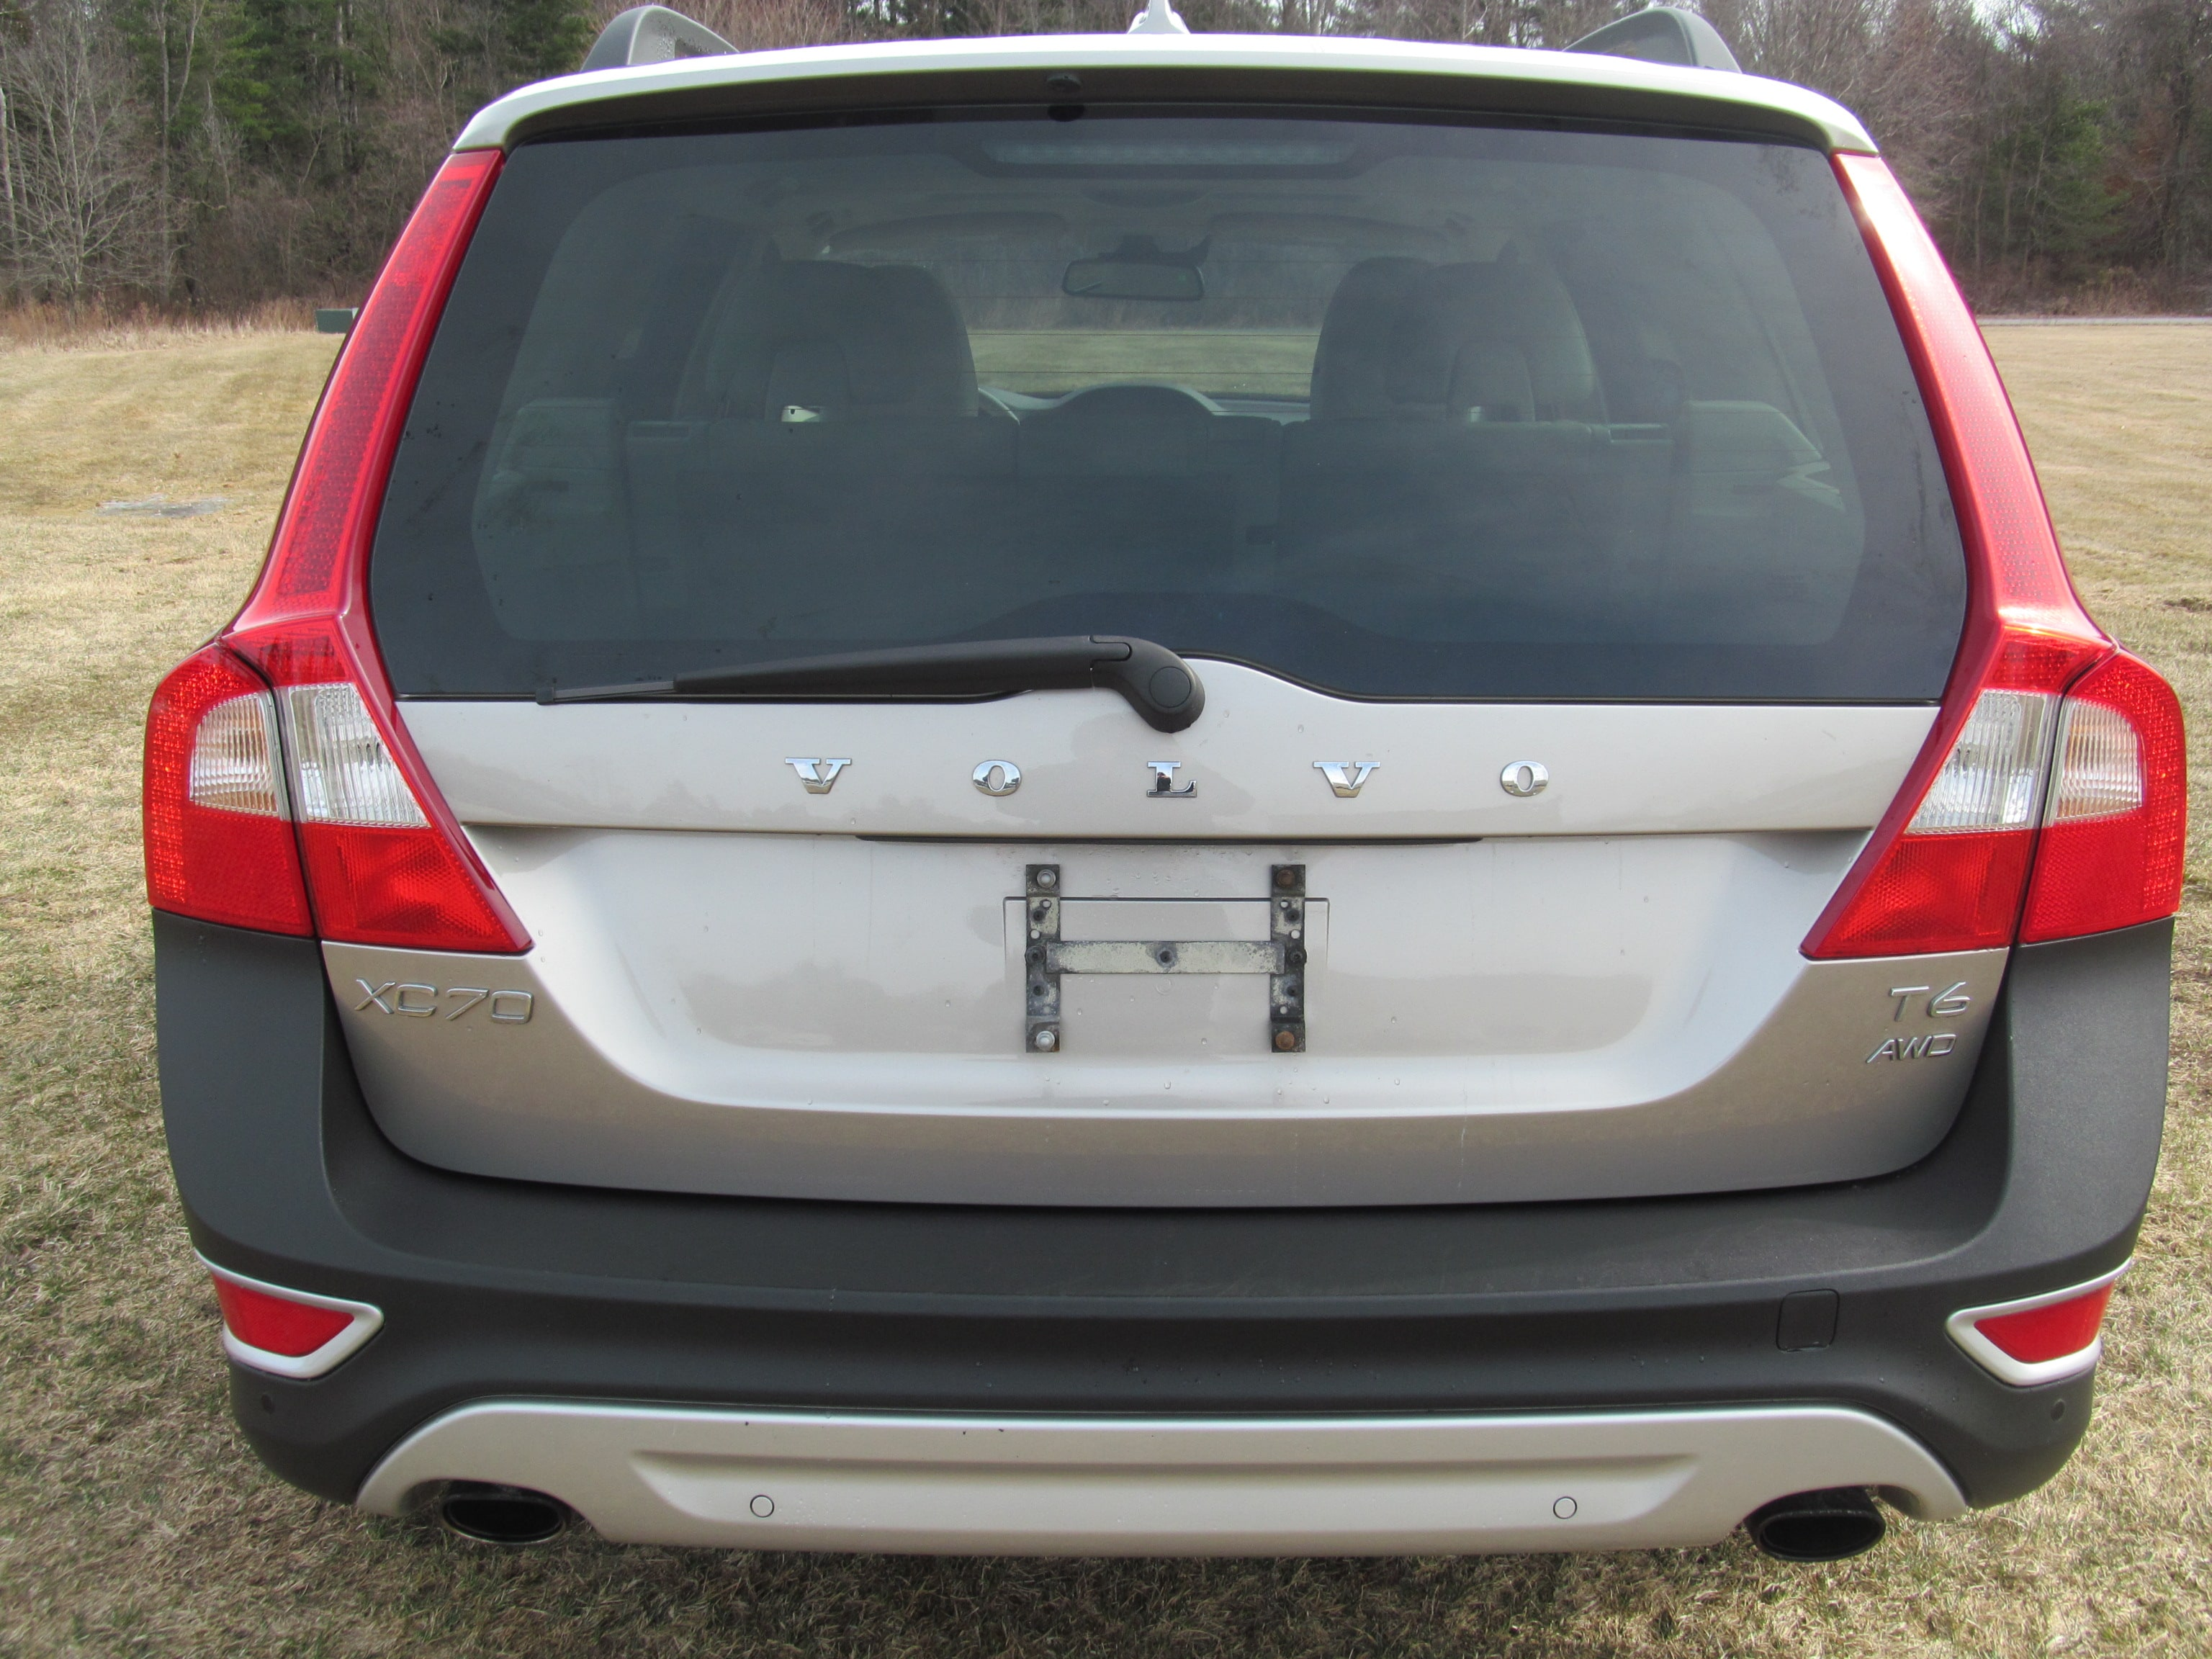 Floor mats volvo xc70 -  2013 Volvo Xc70 T6 Awd Premier Plus Wagon